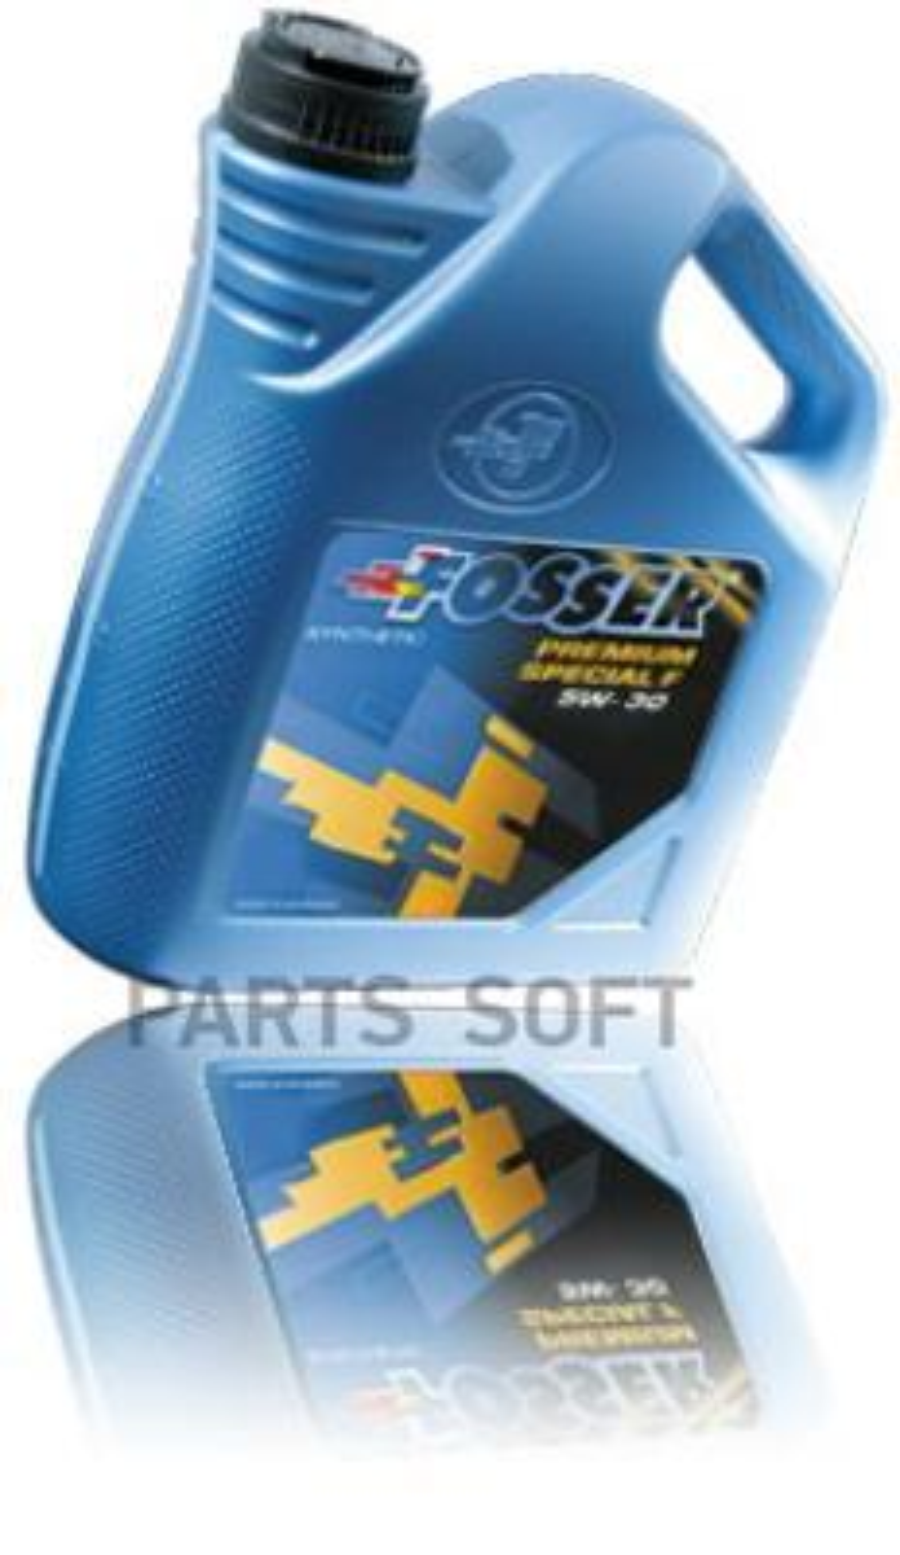 Масло моторное Fosser Premium Special F 5W-30 (4л)